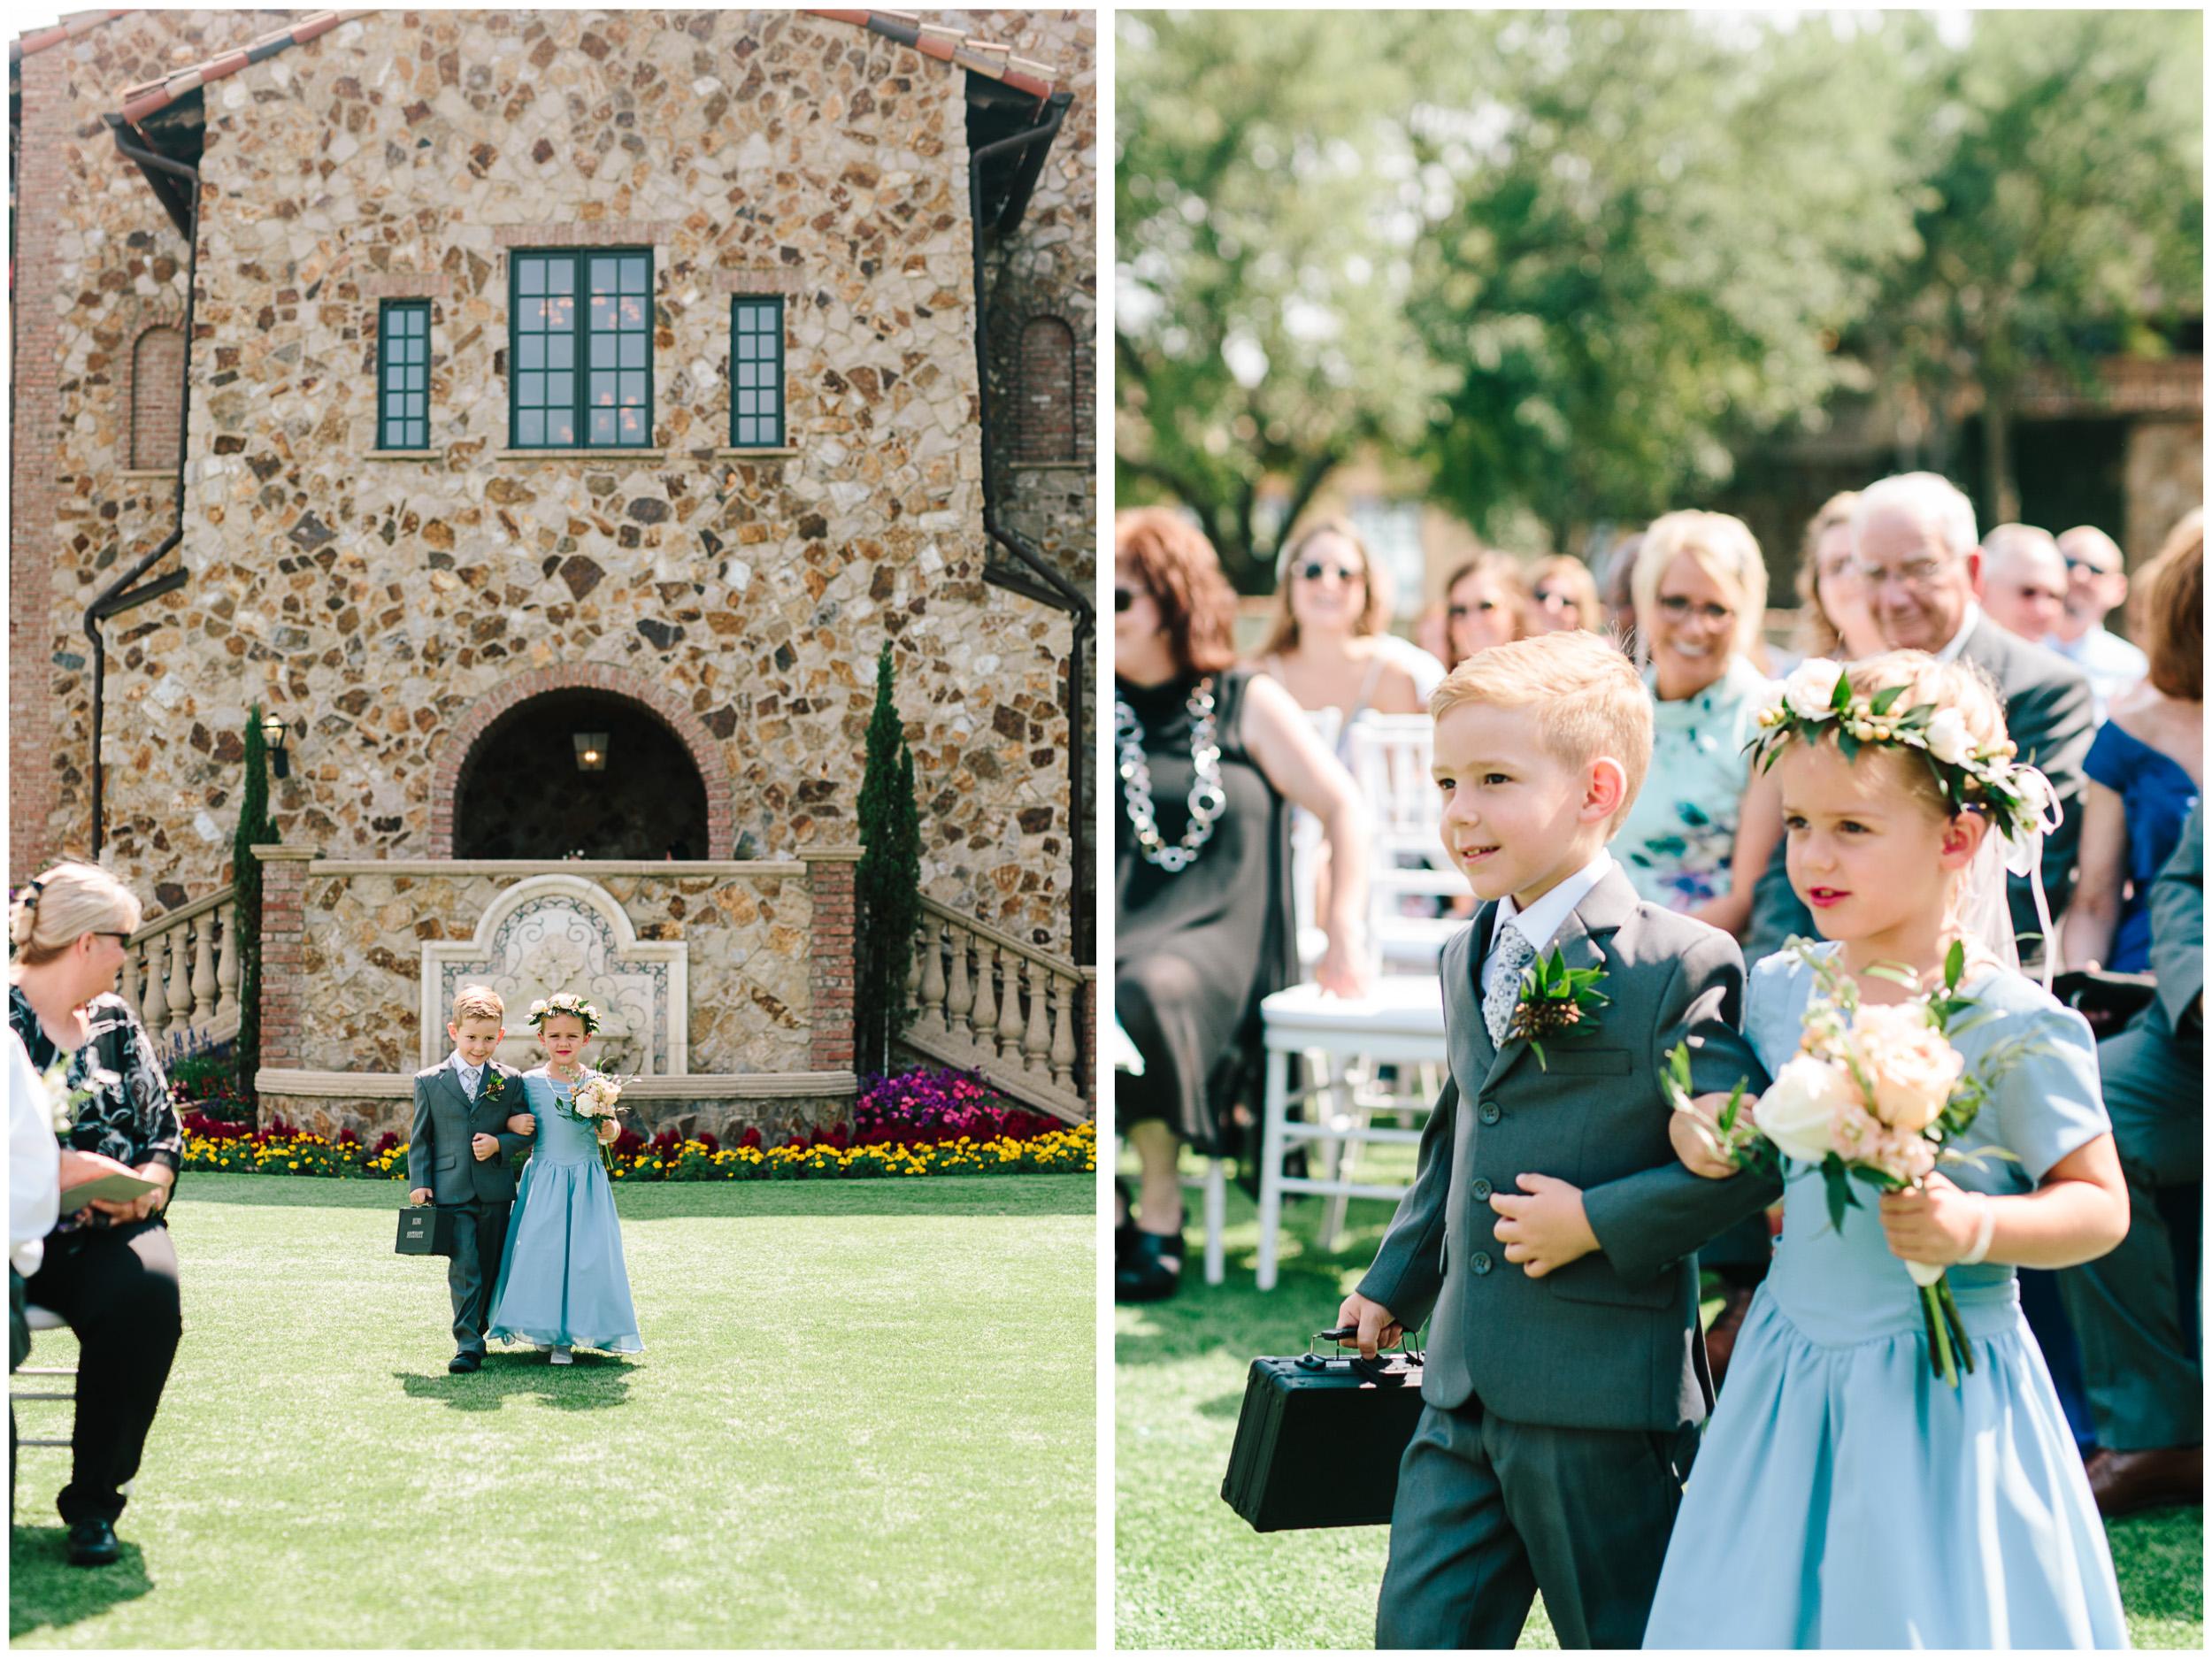 bella_collina_wedding_34.jpg